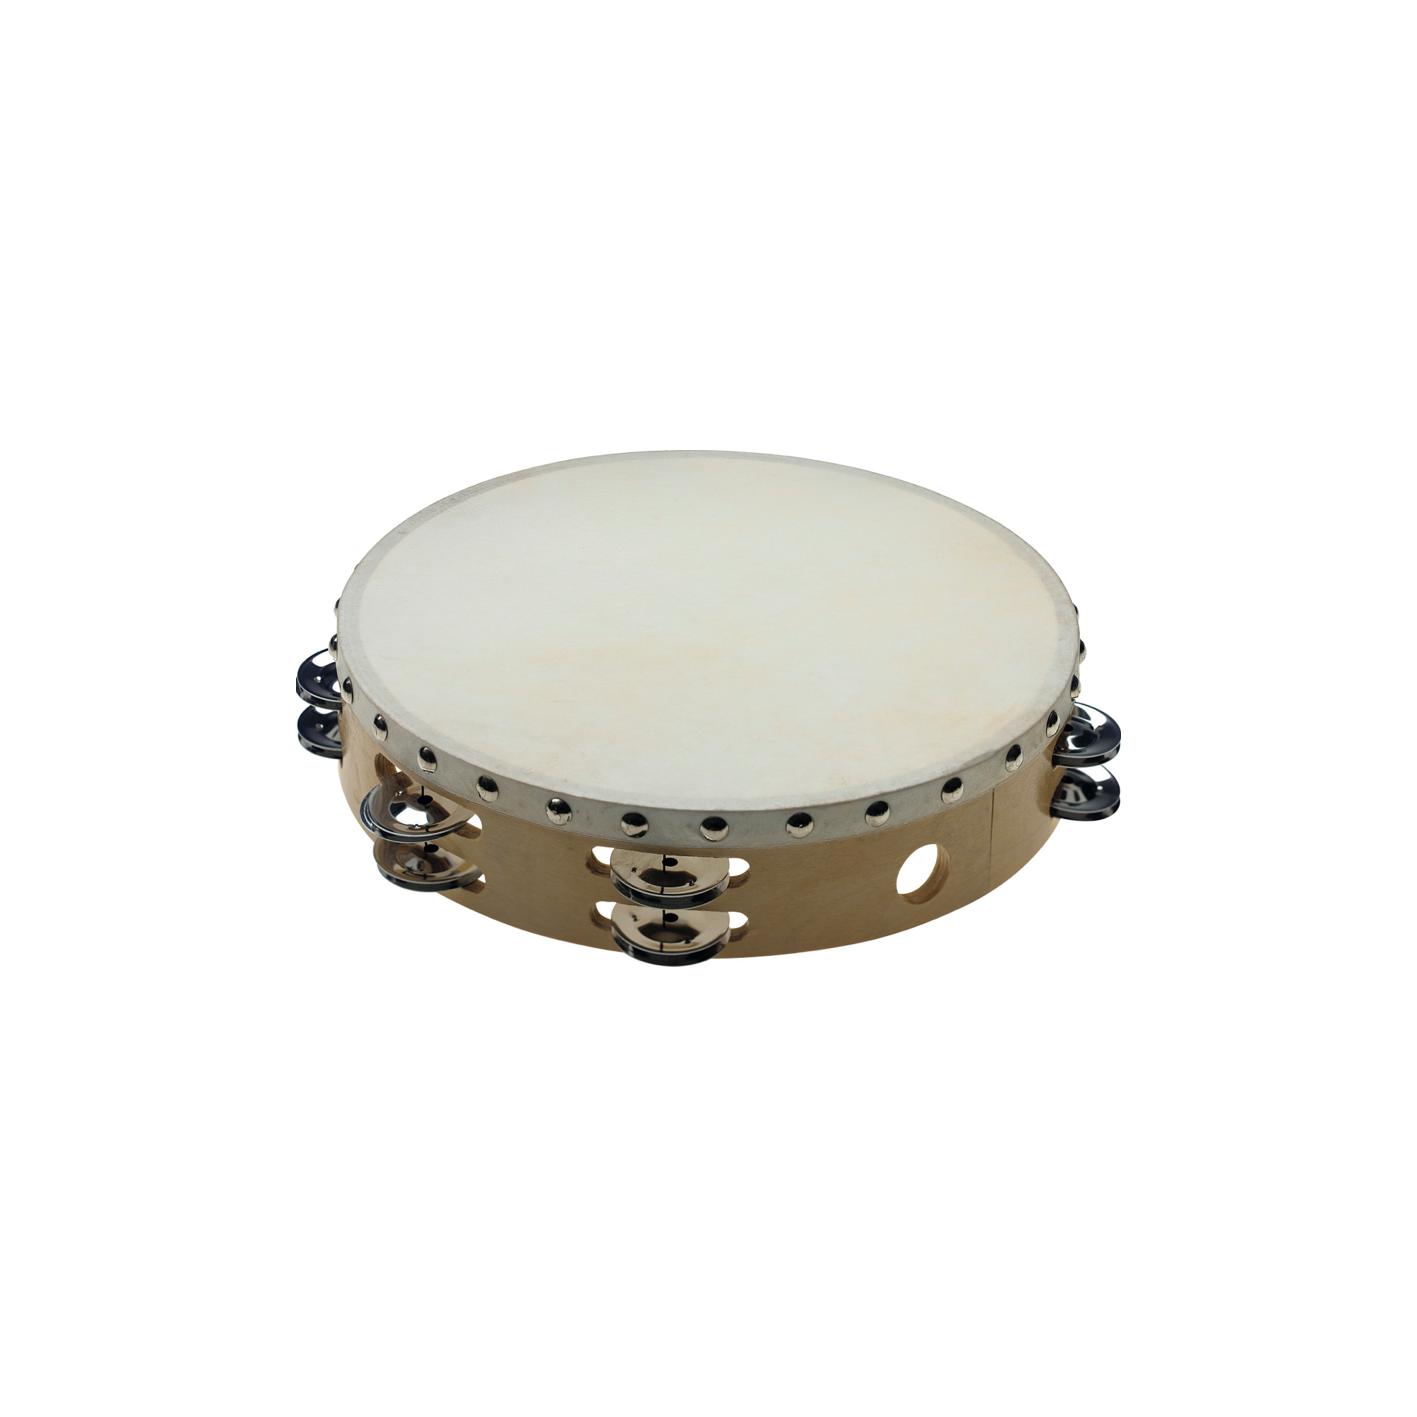 "Stagg STA-1210 10"" Pretuned Tambourine"